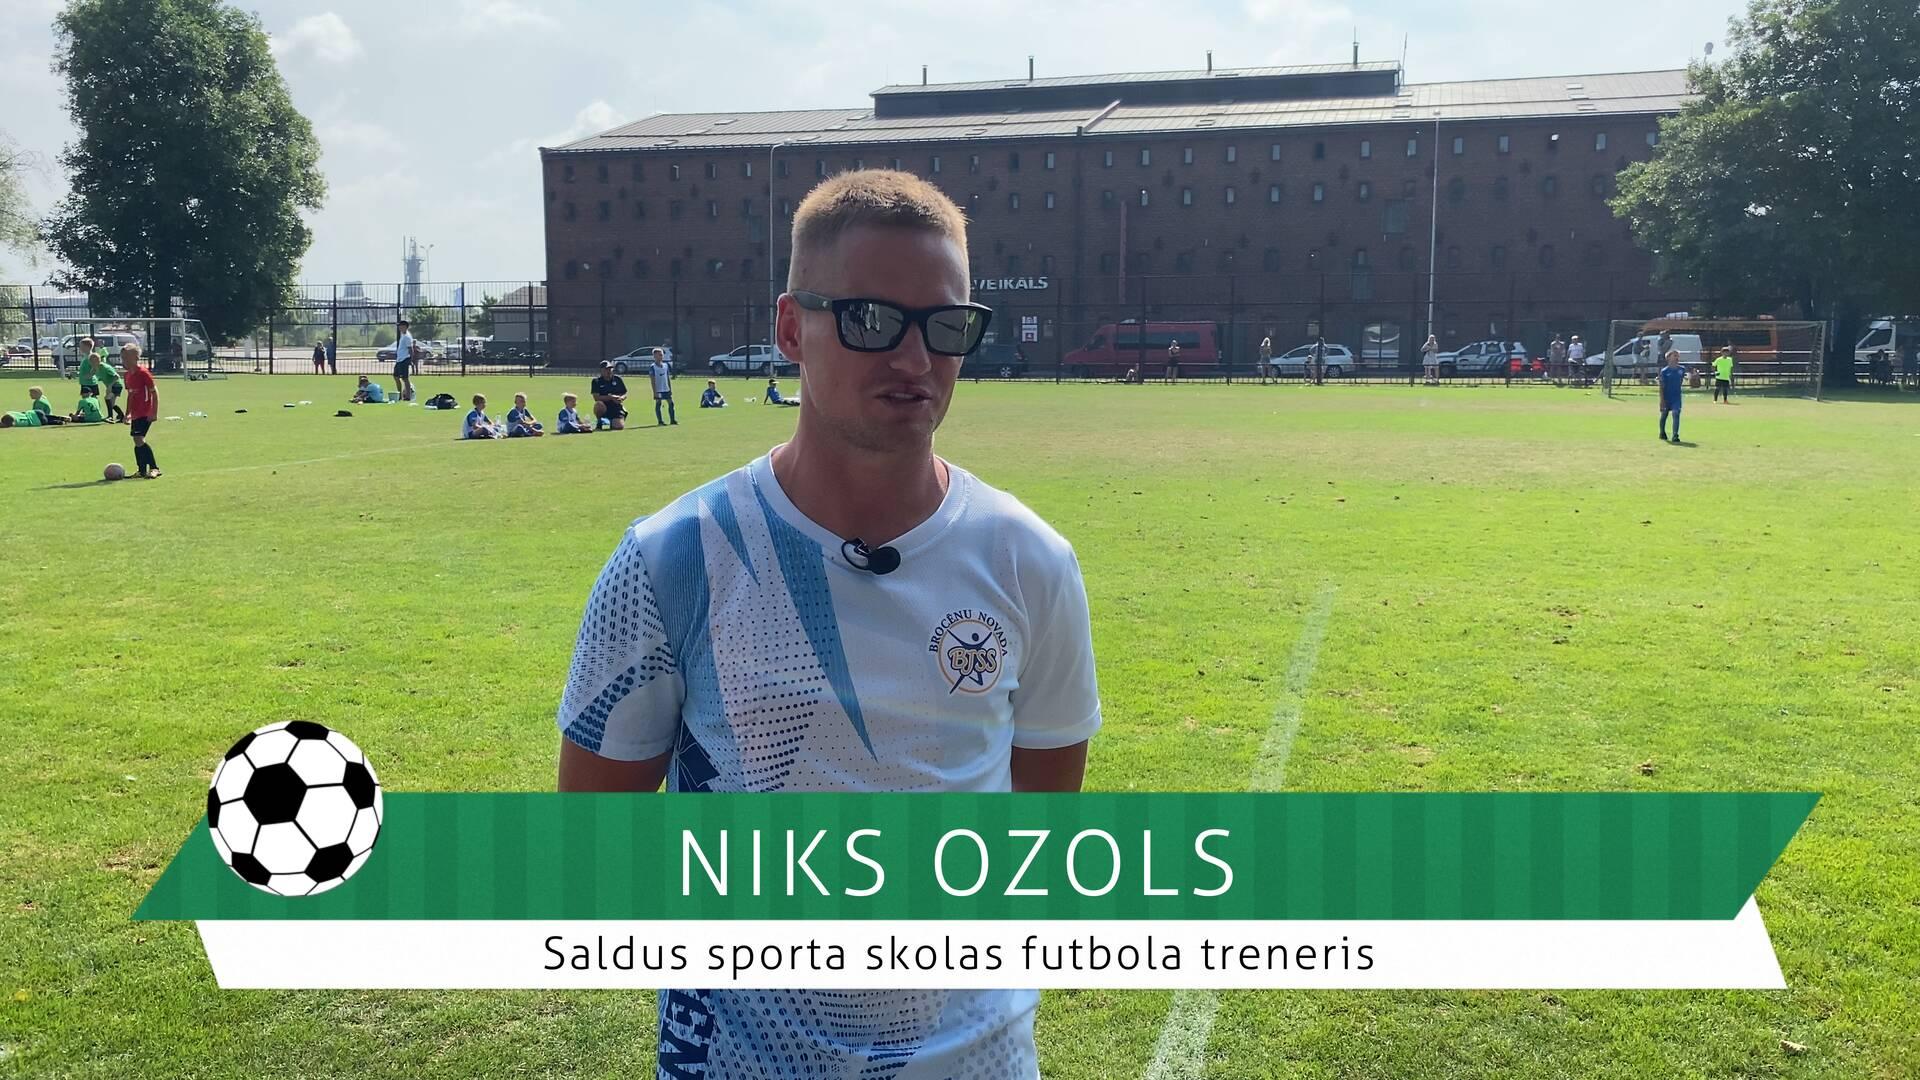 #FutbolsReģionos: saruna ar Saldus sporta skolas futbola treneri Niku Ozolu